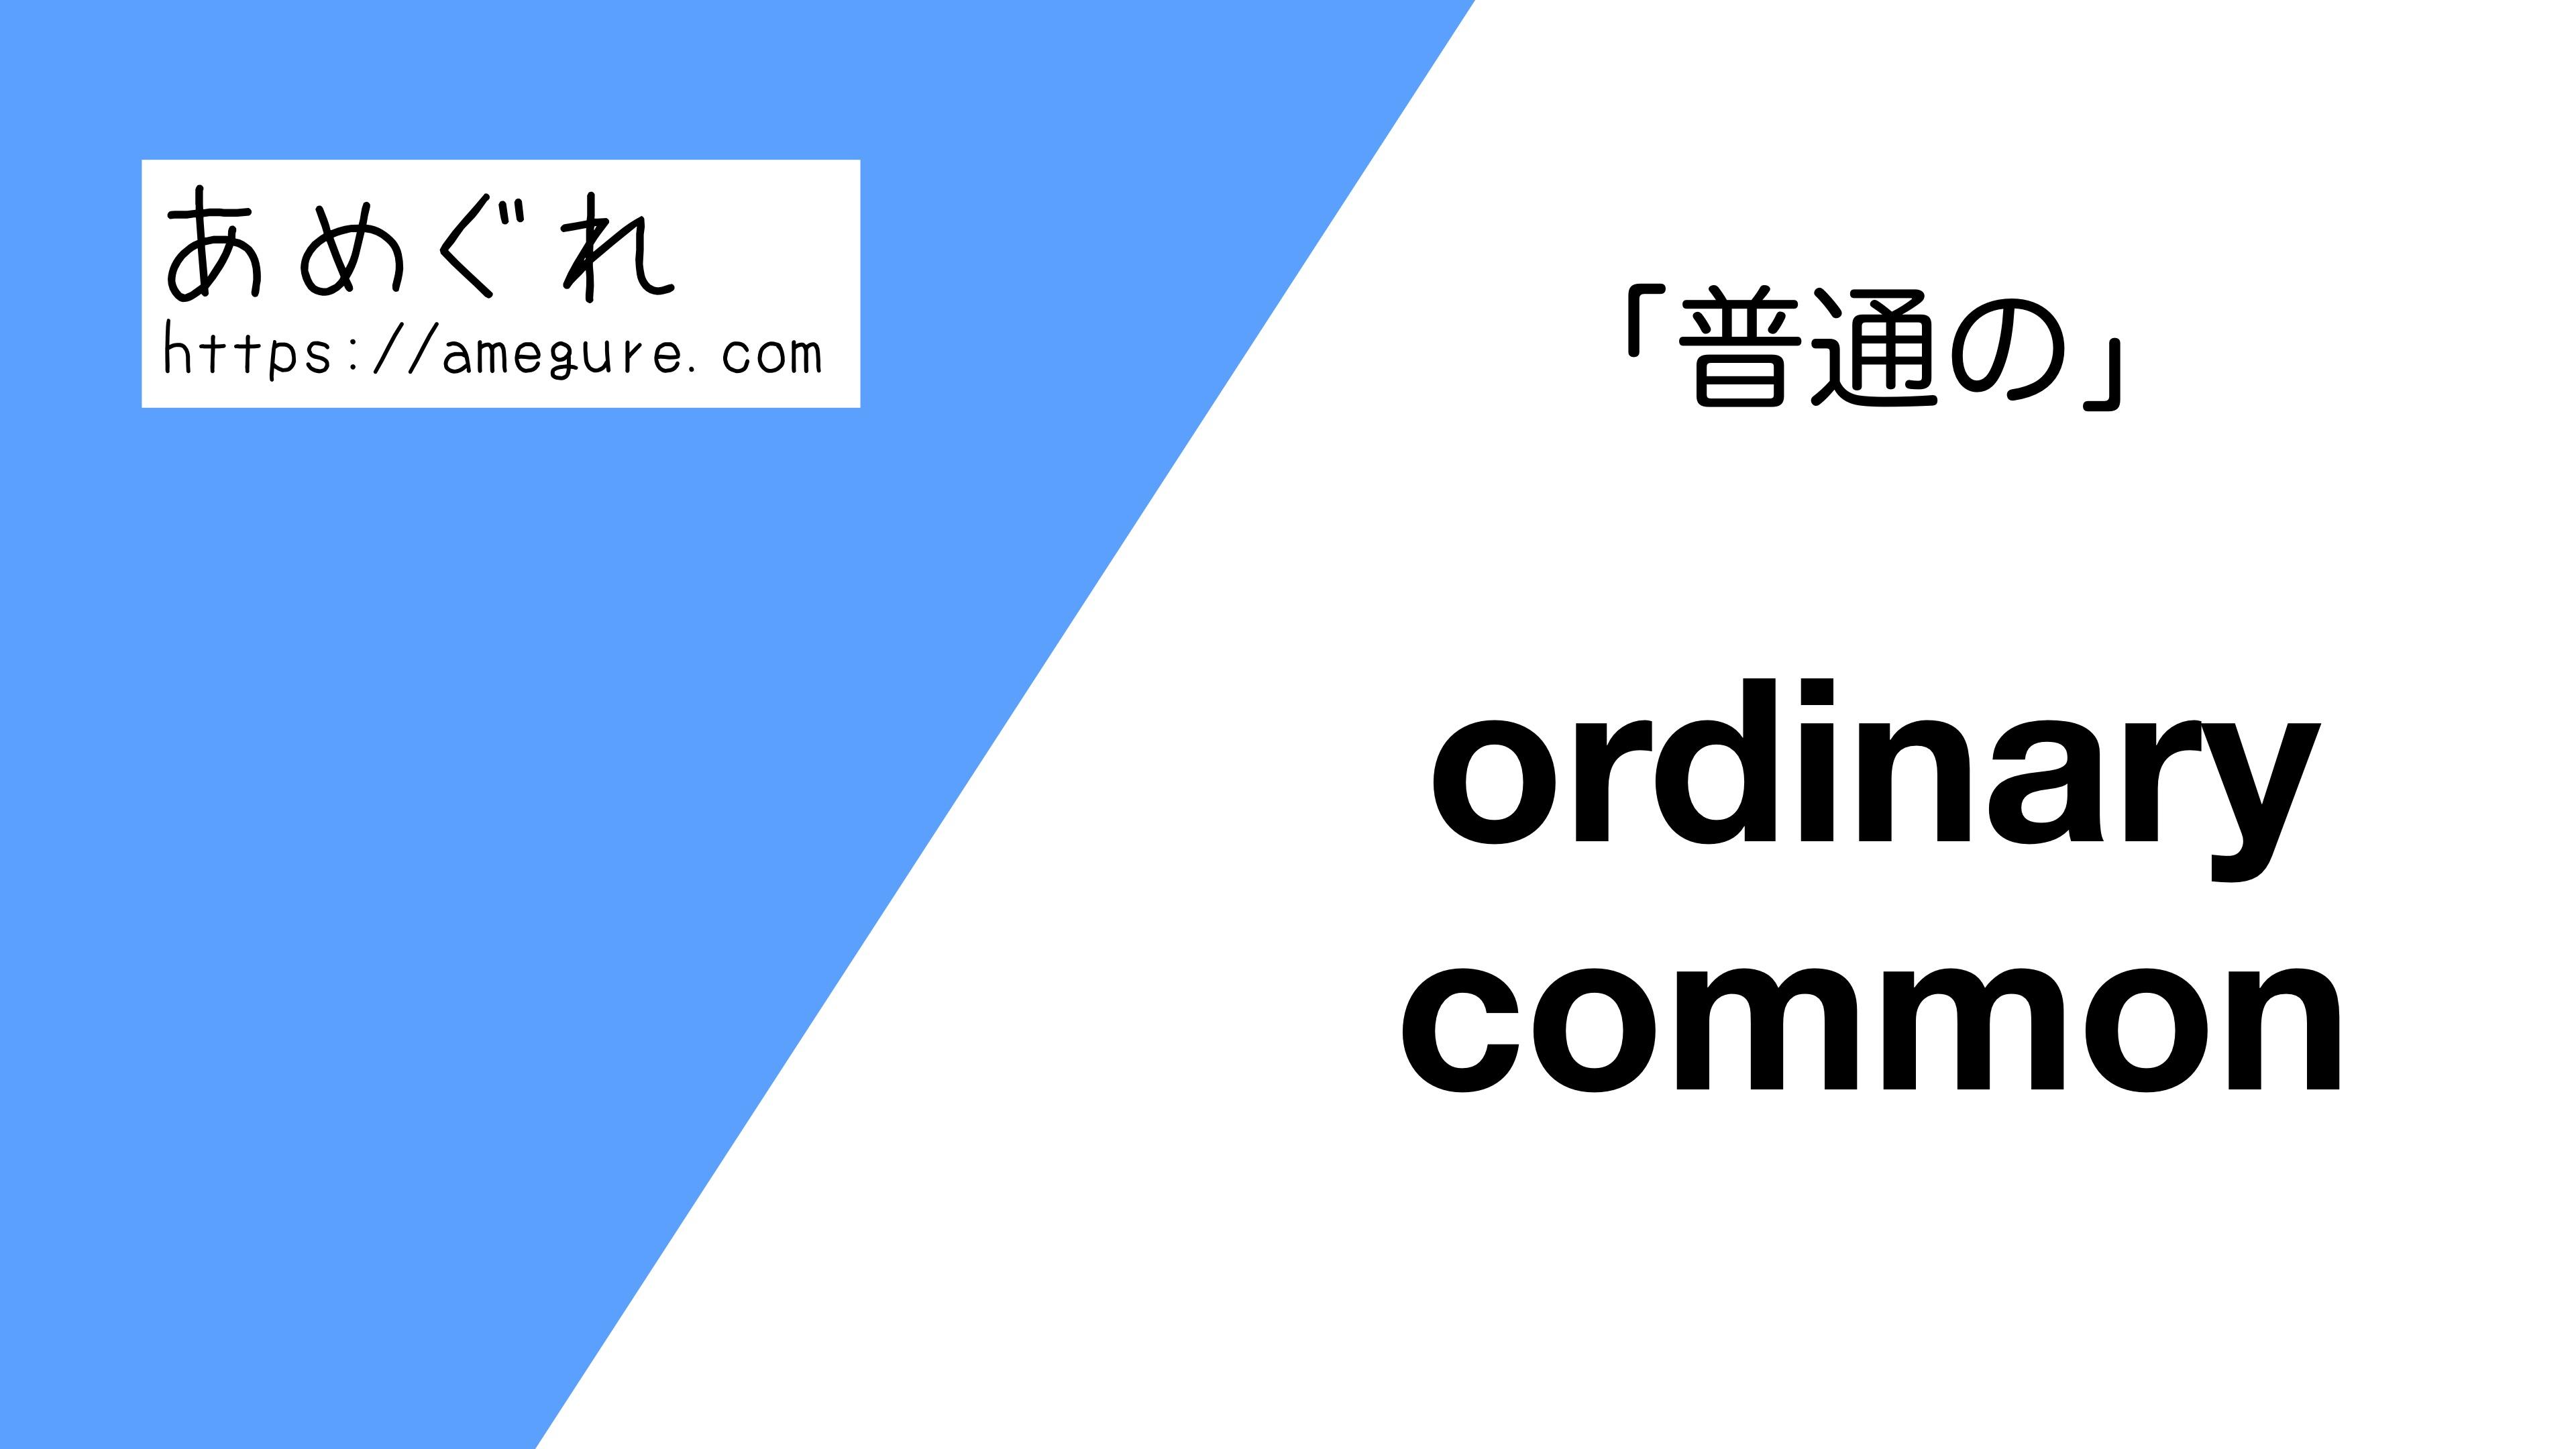 ordinary-common違い